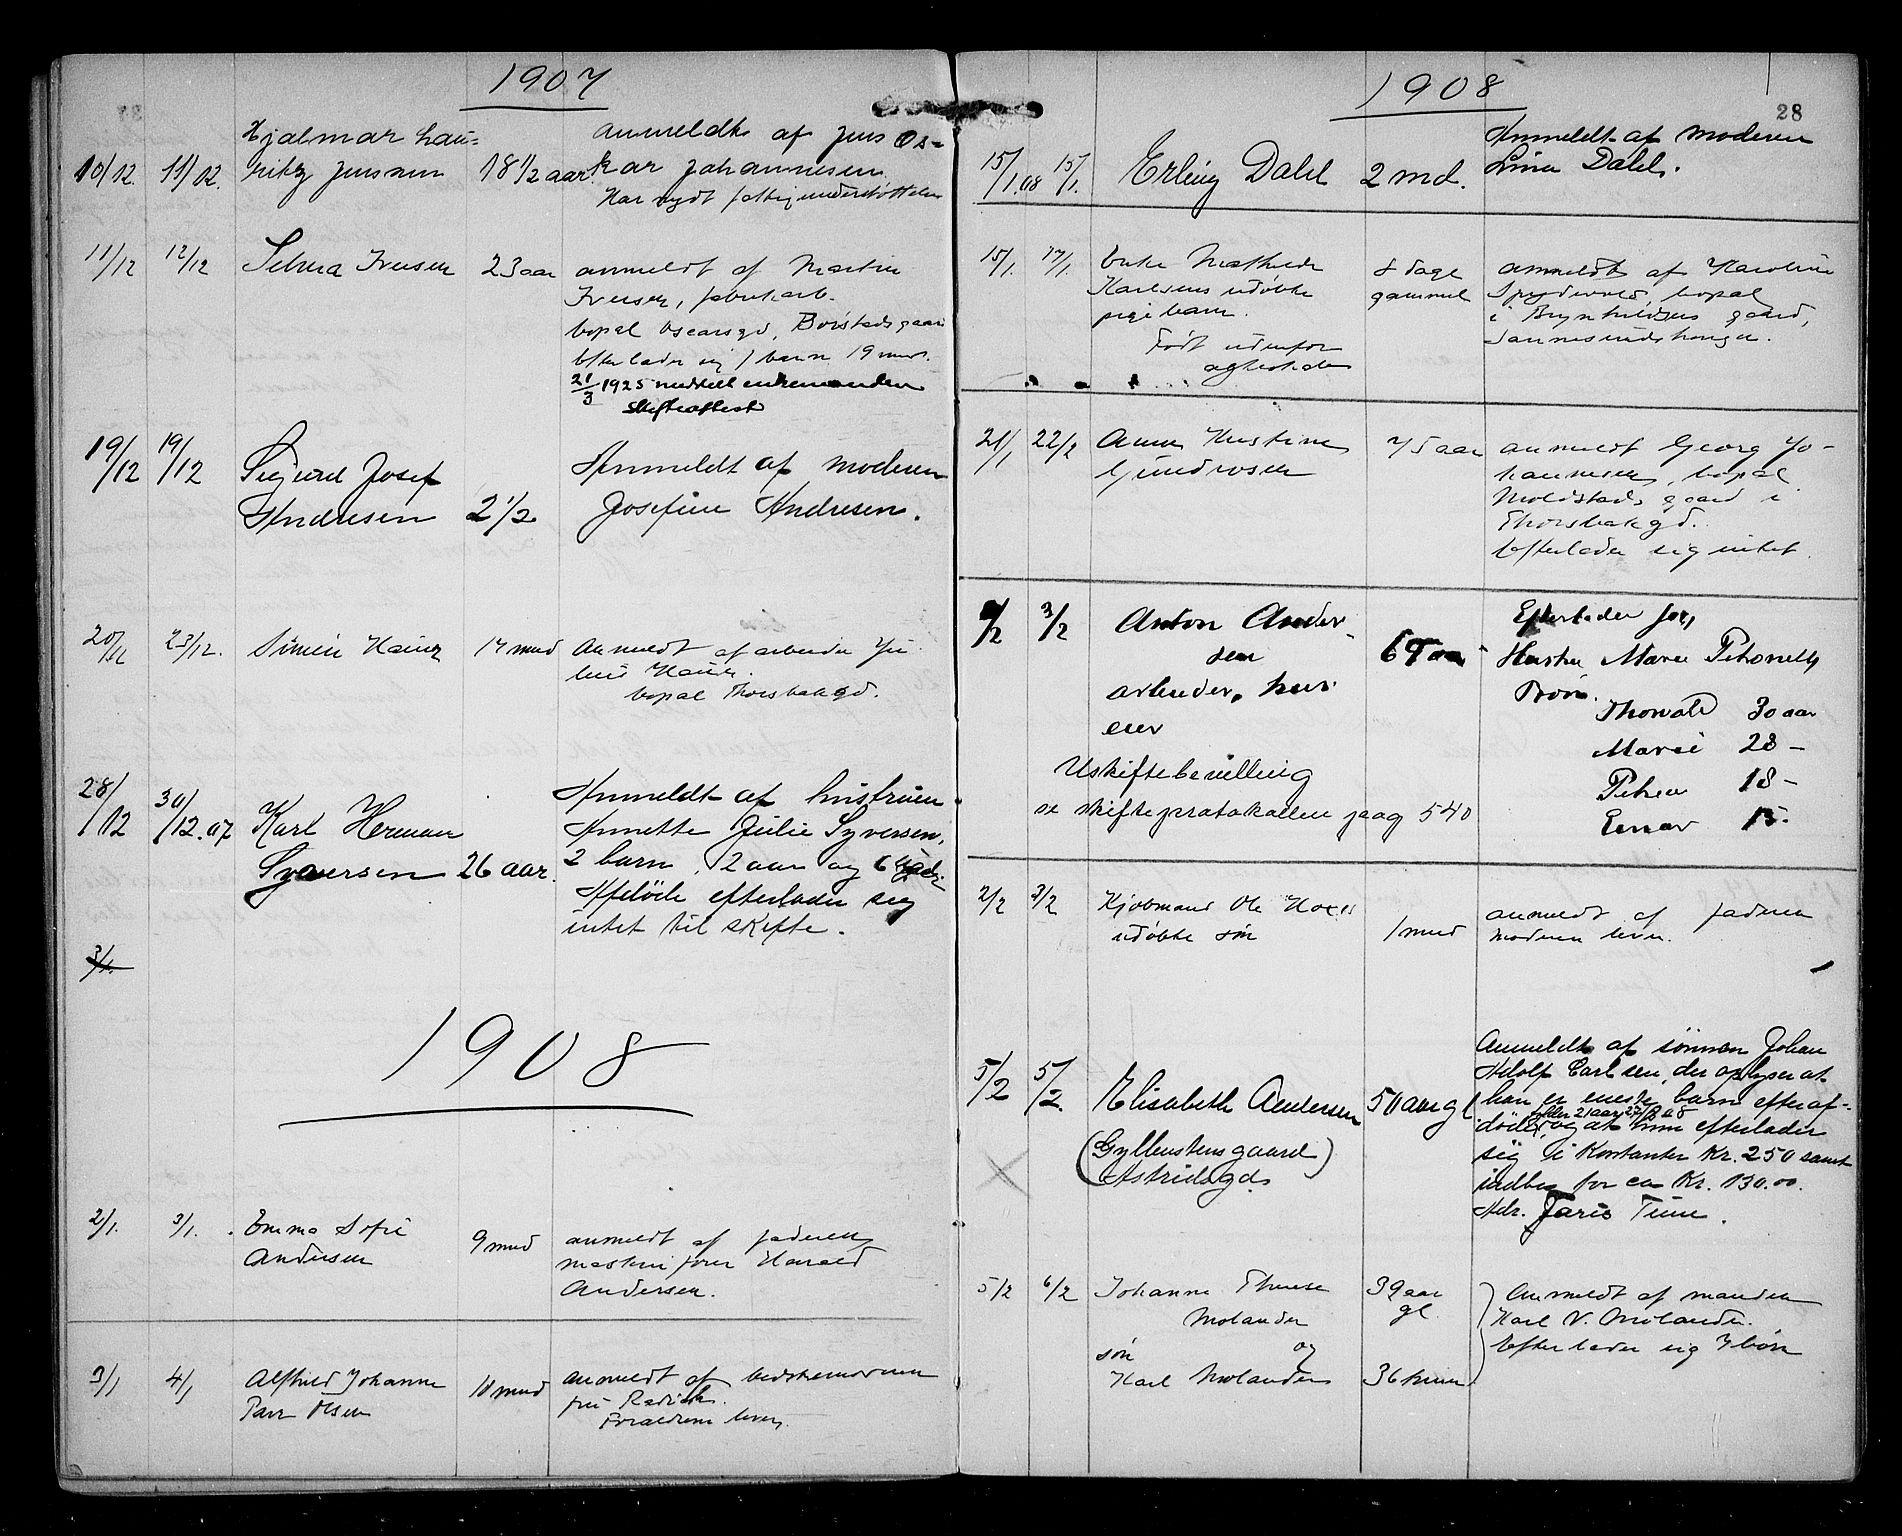 SAO, Sarpsborg byfogd, H/Ha/Haa/L0002: Dødsfallsprotokoll, 1904-1914, s. 27b-28a